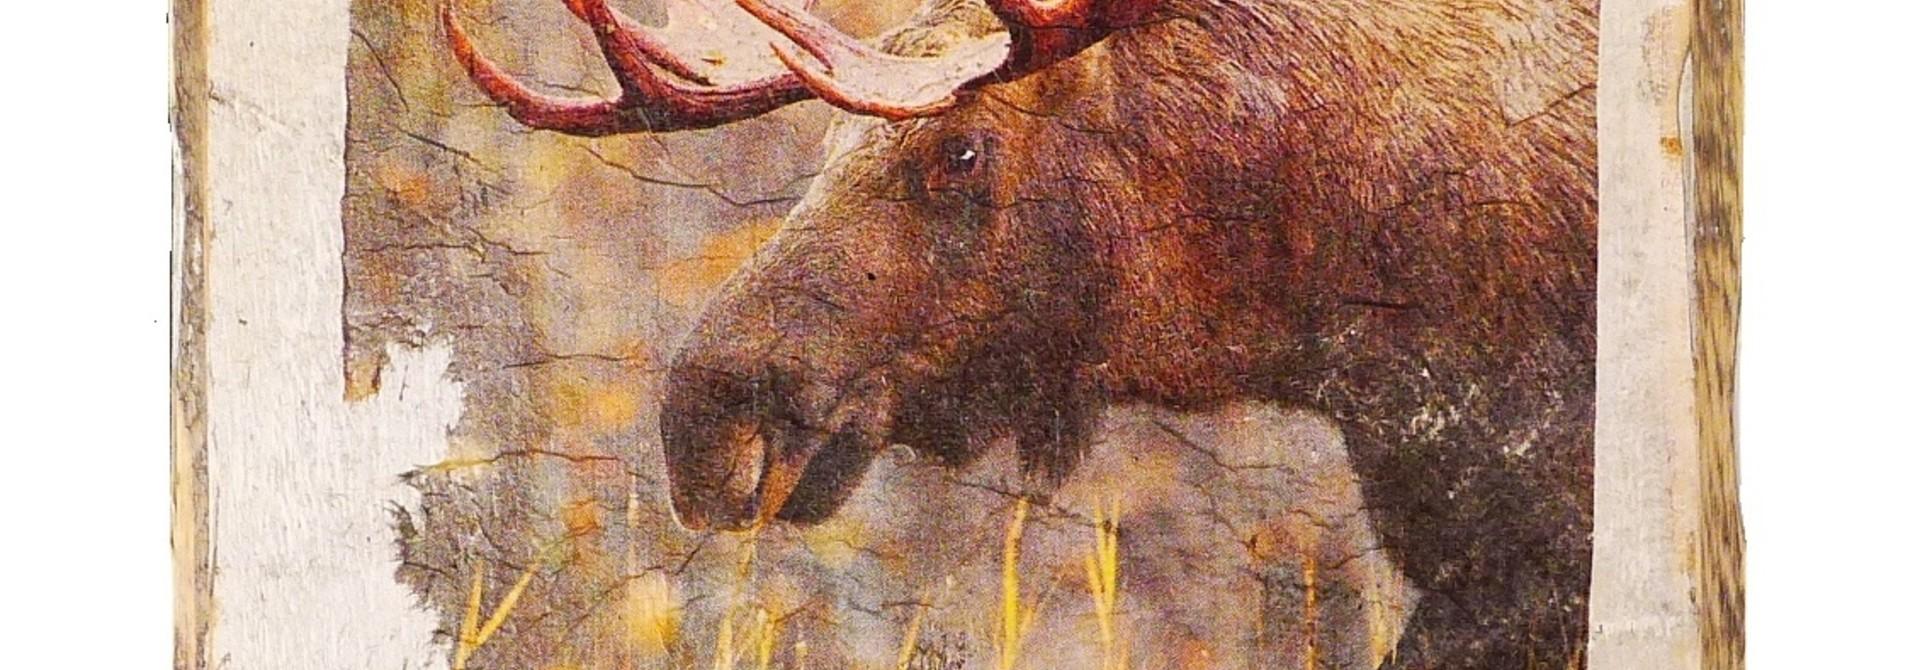 wooden tile old dutch moose out